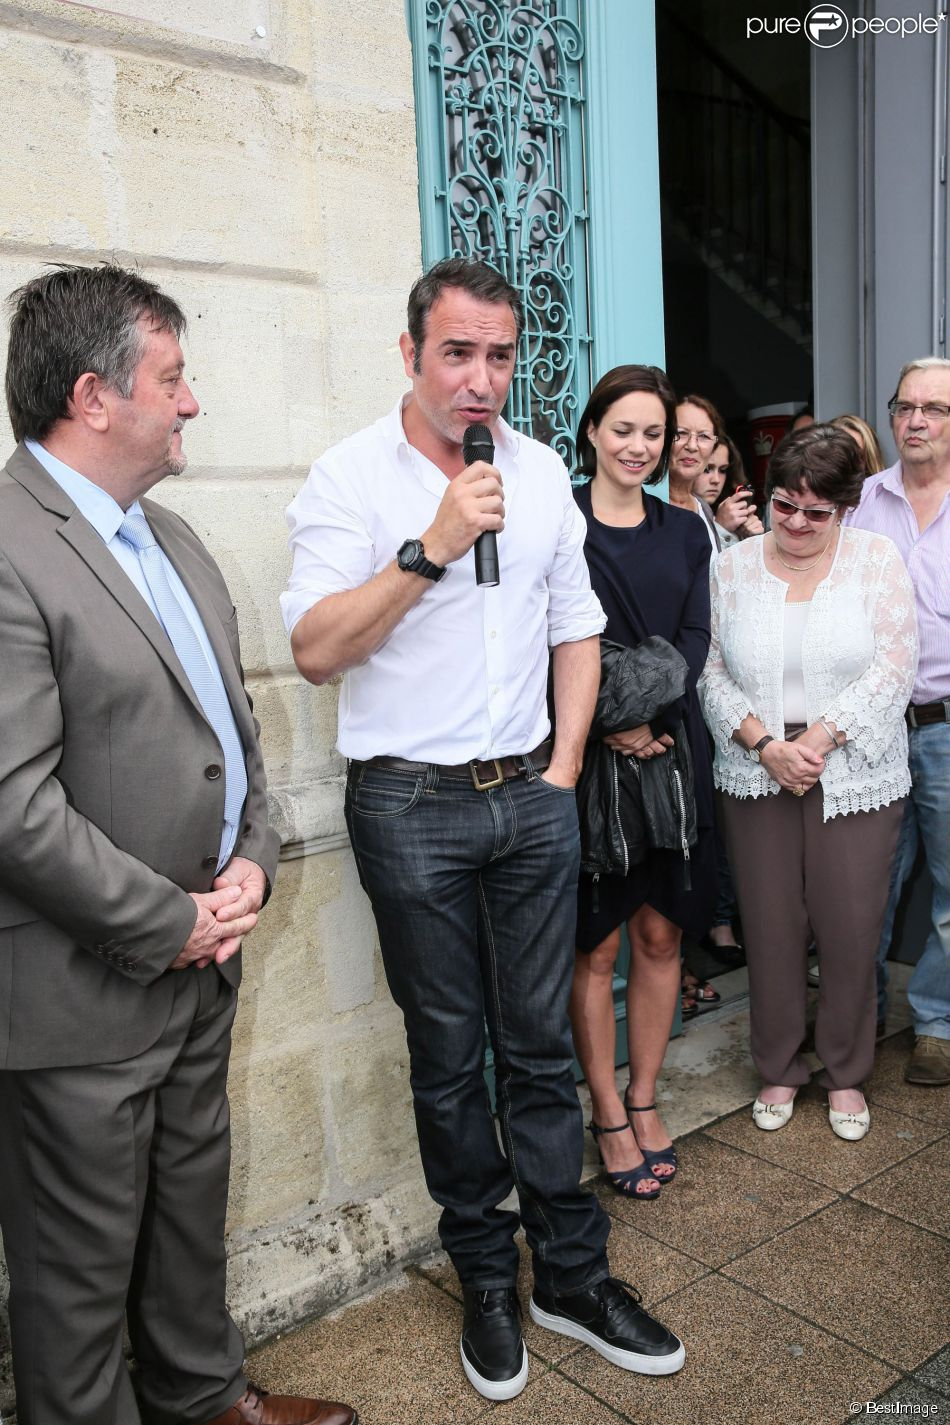 Bernard guiraud maire de lesparre m doc jean dujardin for Jean dujardin pechalat